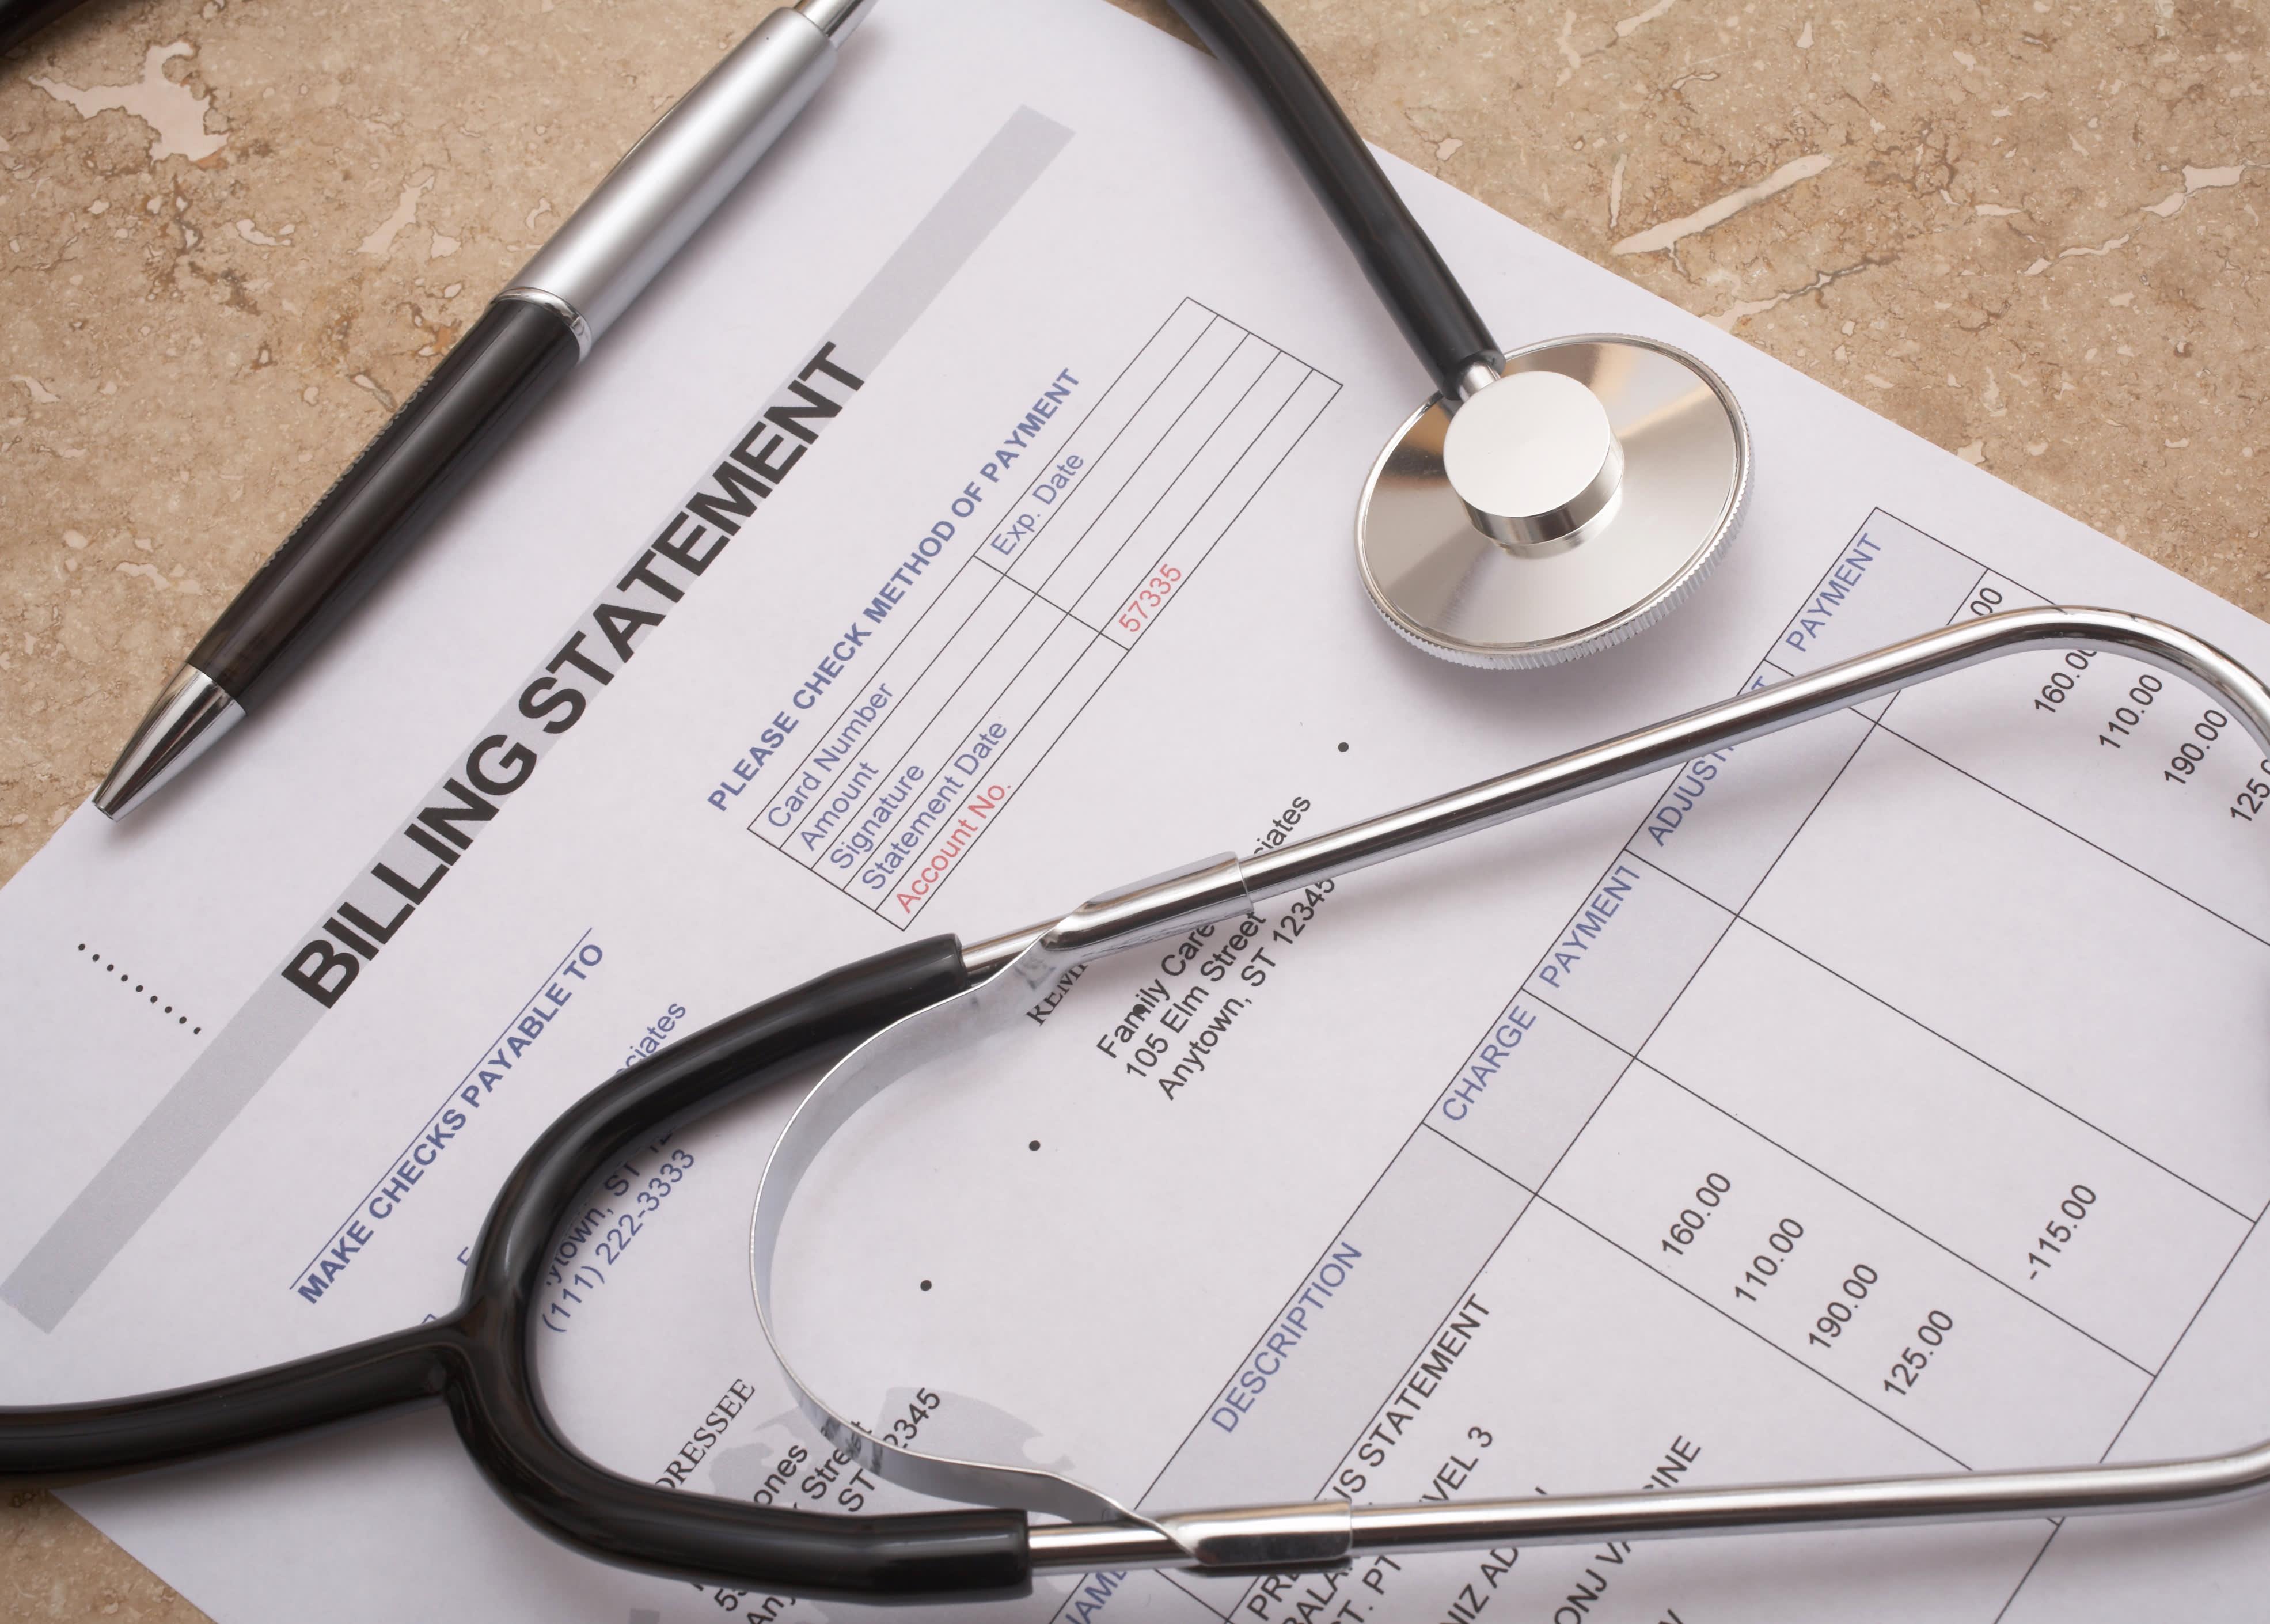 Premium: Medical bill debt health care costs